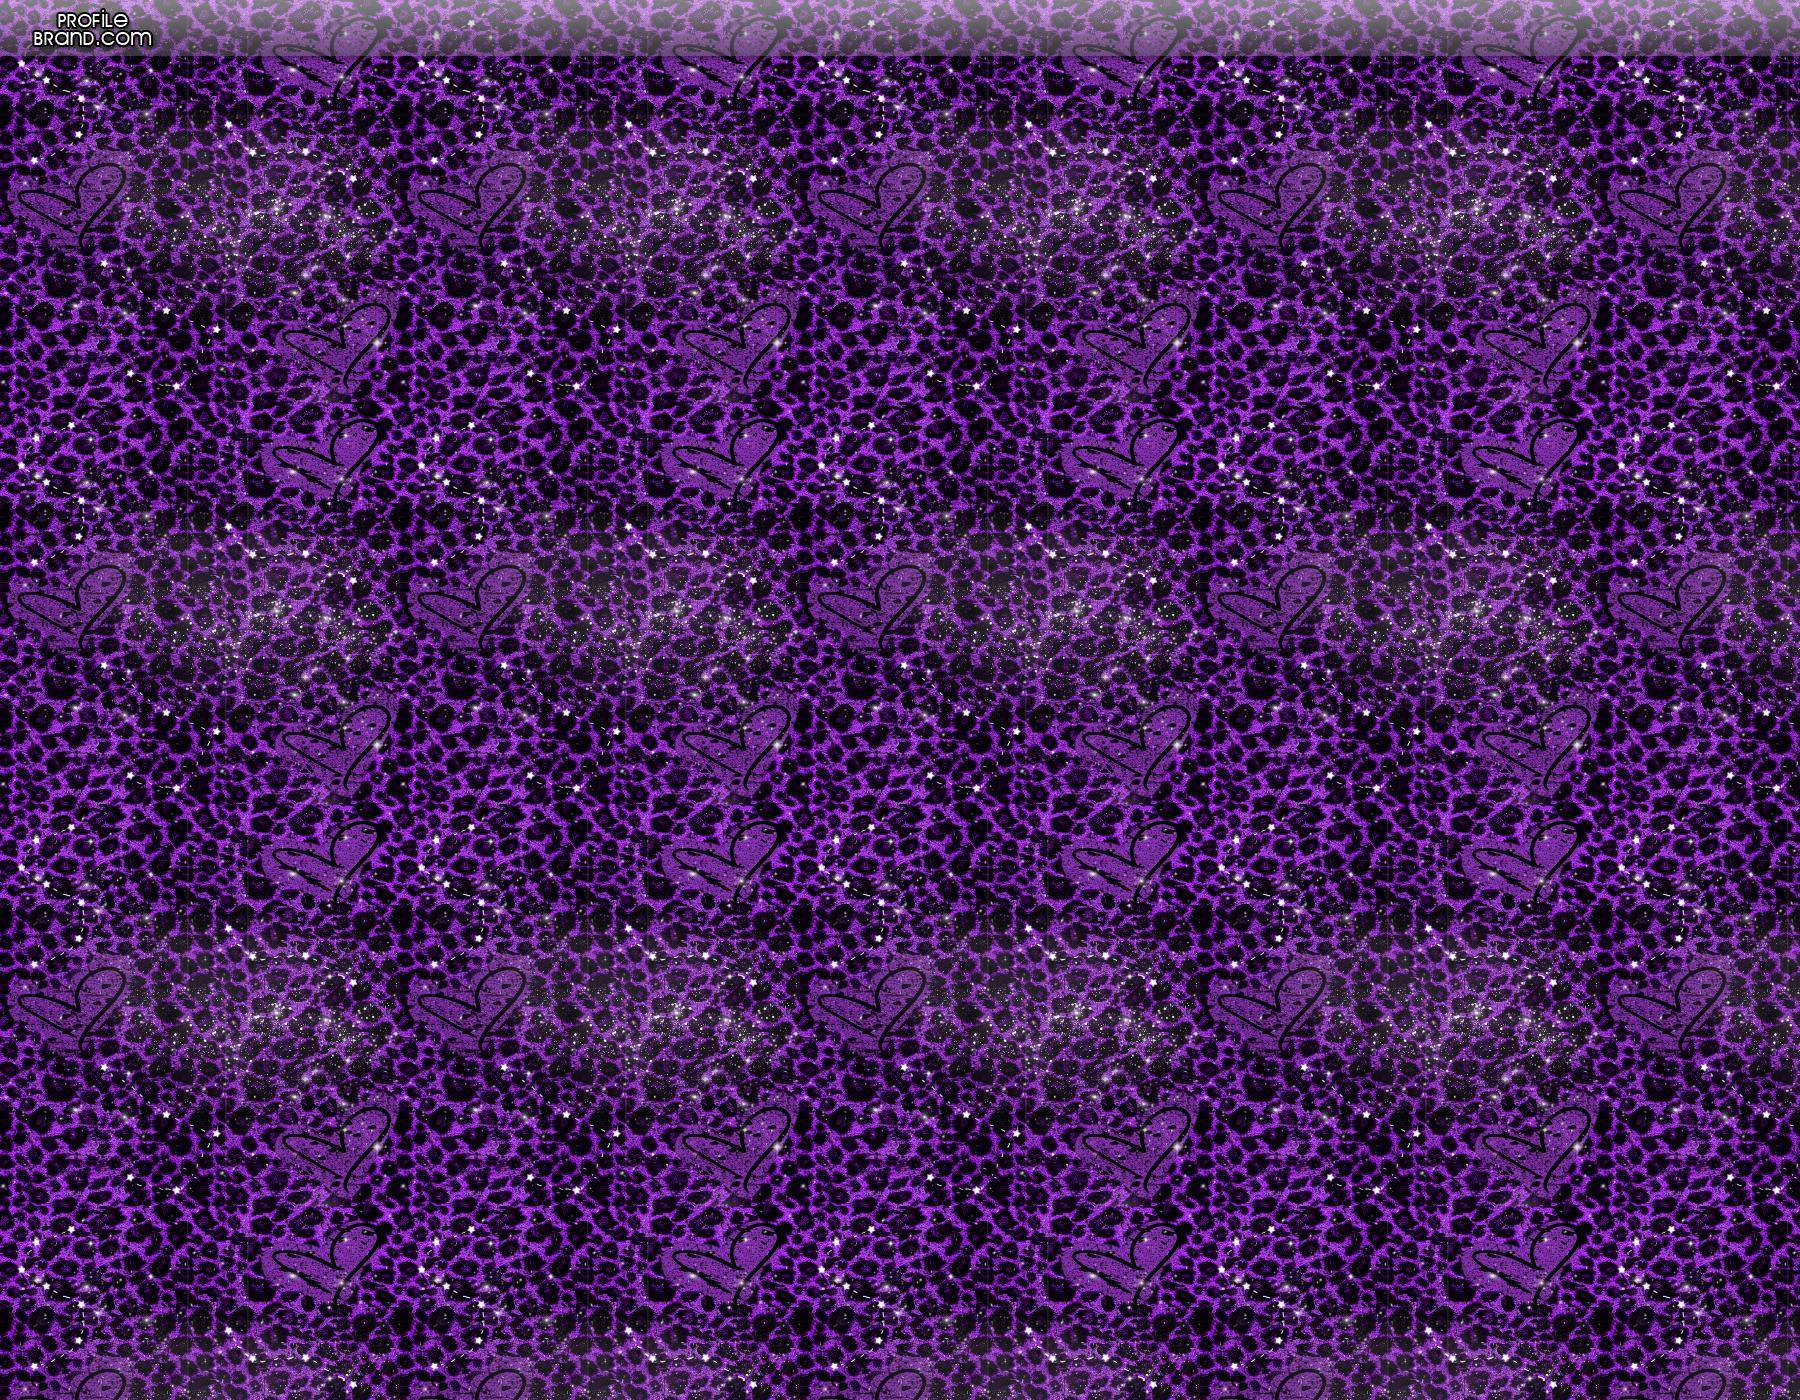 Purple twitter backgrounds wallpaper cave - Purple cheetah print background ...